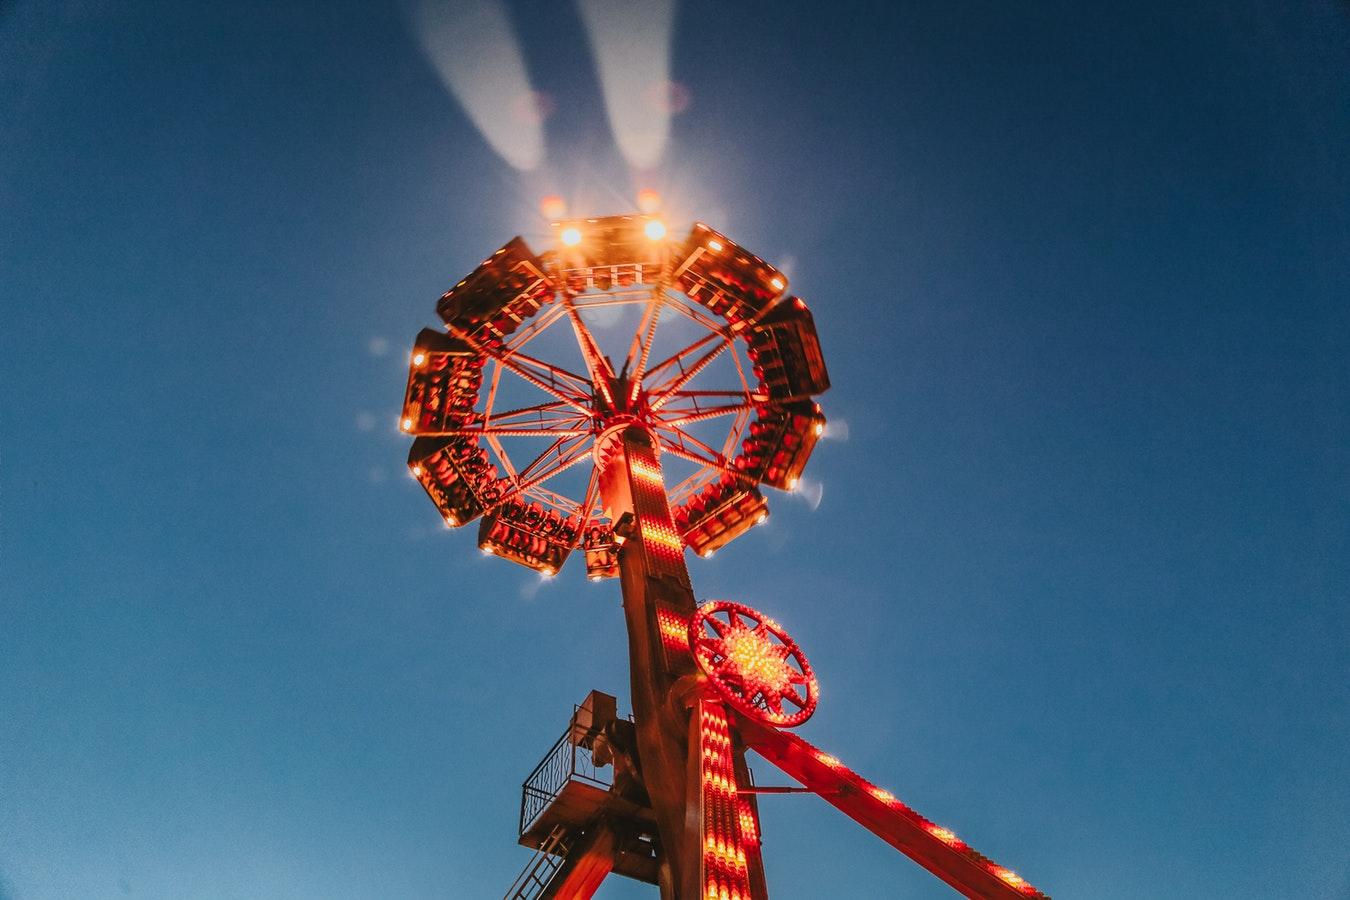 Large pendulum factory frisbee ride super swing